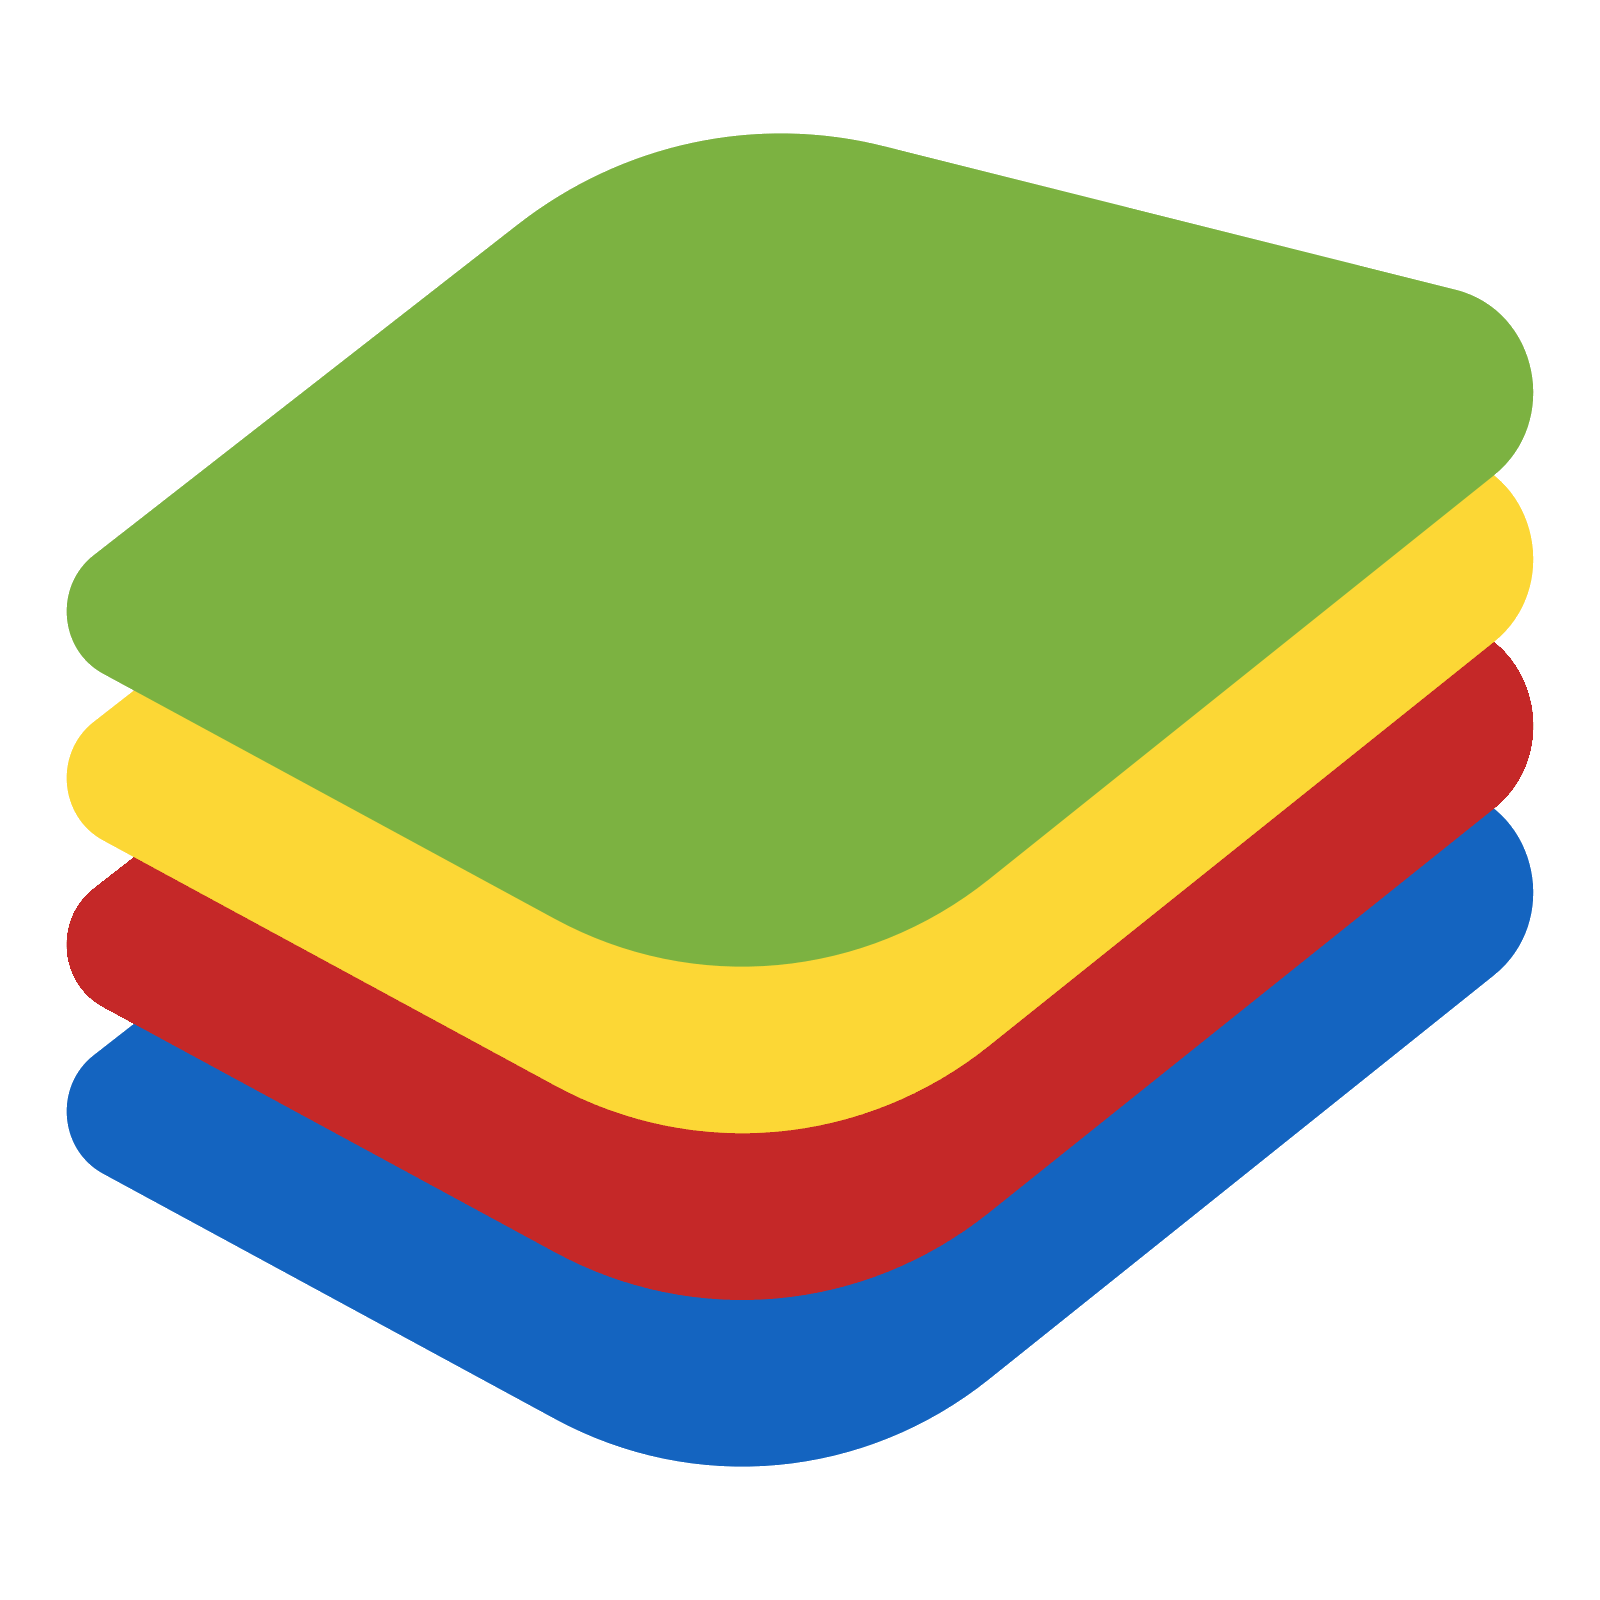 bluestacks app player for windows 7 free download offline installer